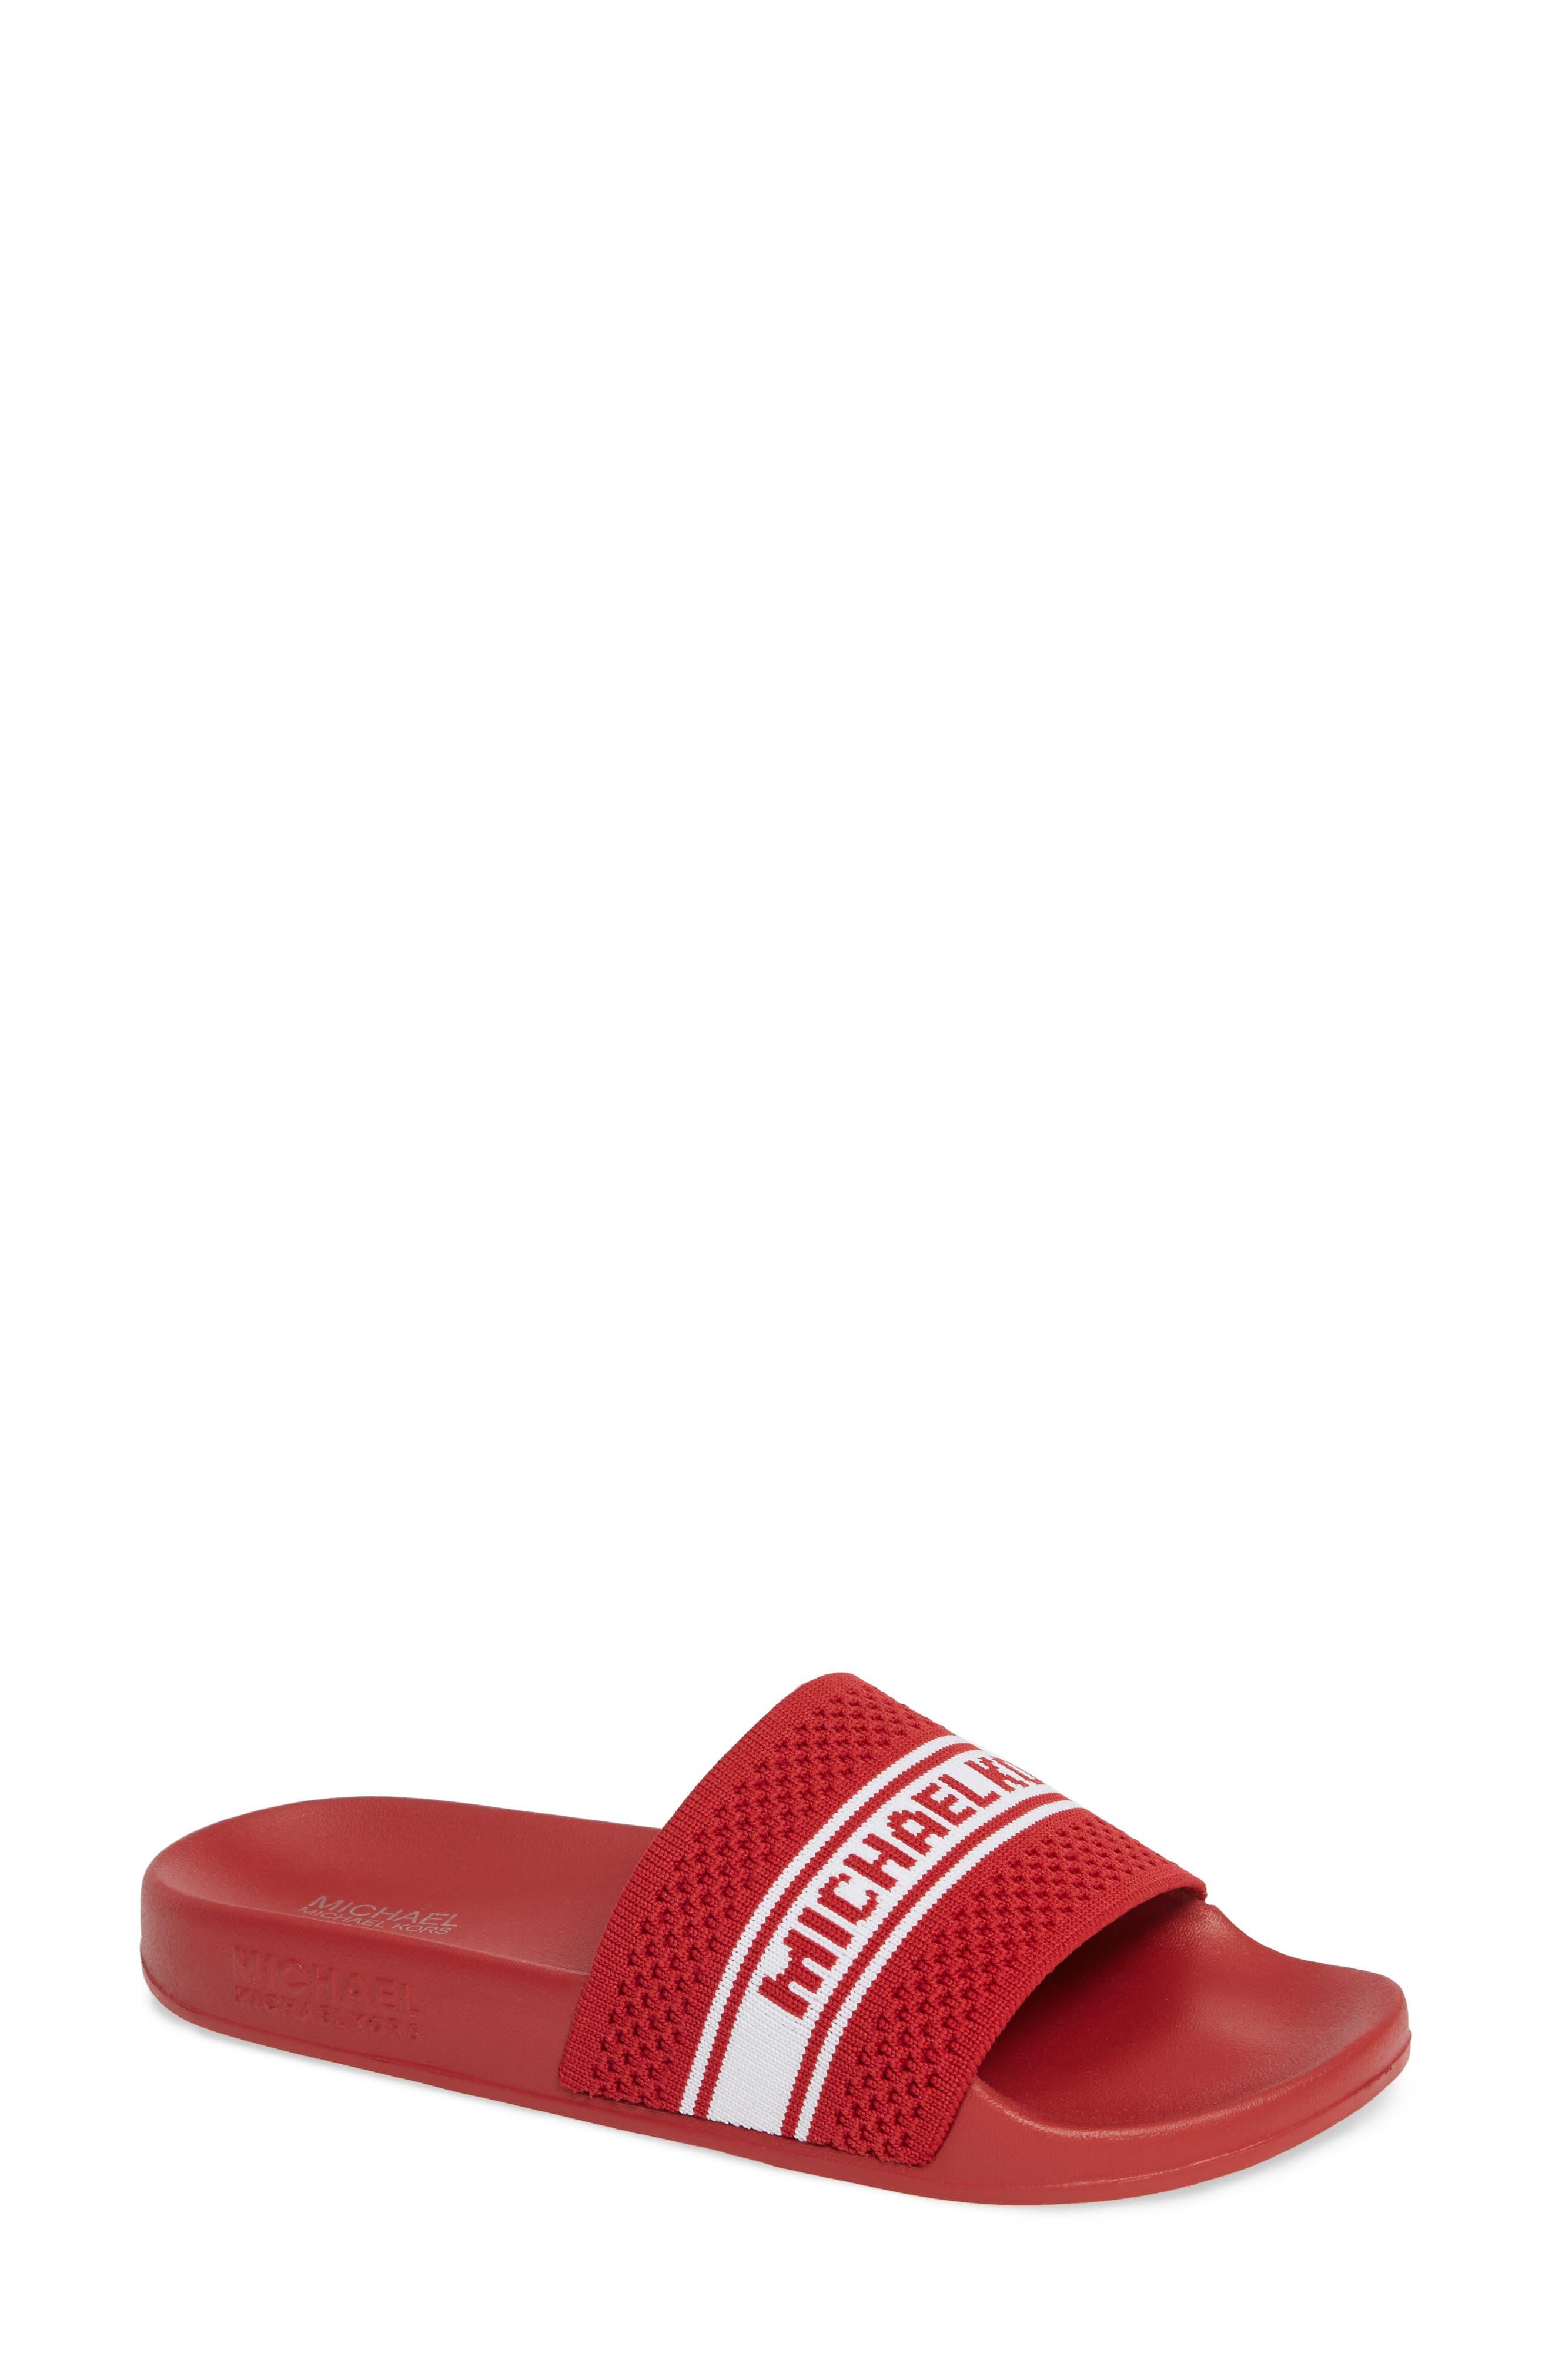 MICHAEL MICHAEL KORS, Gilmore Slide Sandal, Main thumbnail 1, color, BRIGHT RED FABRIC